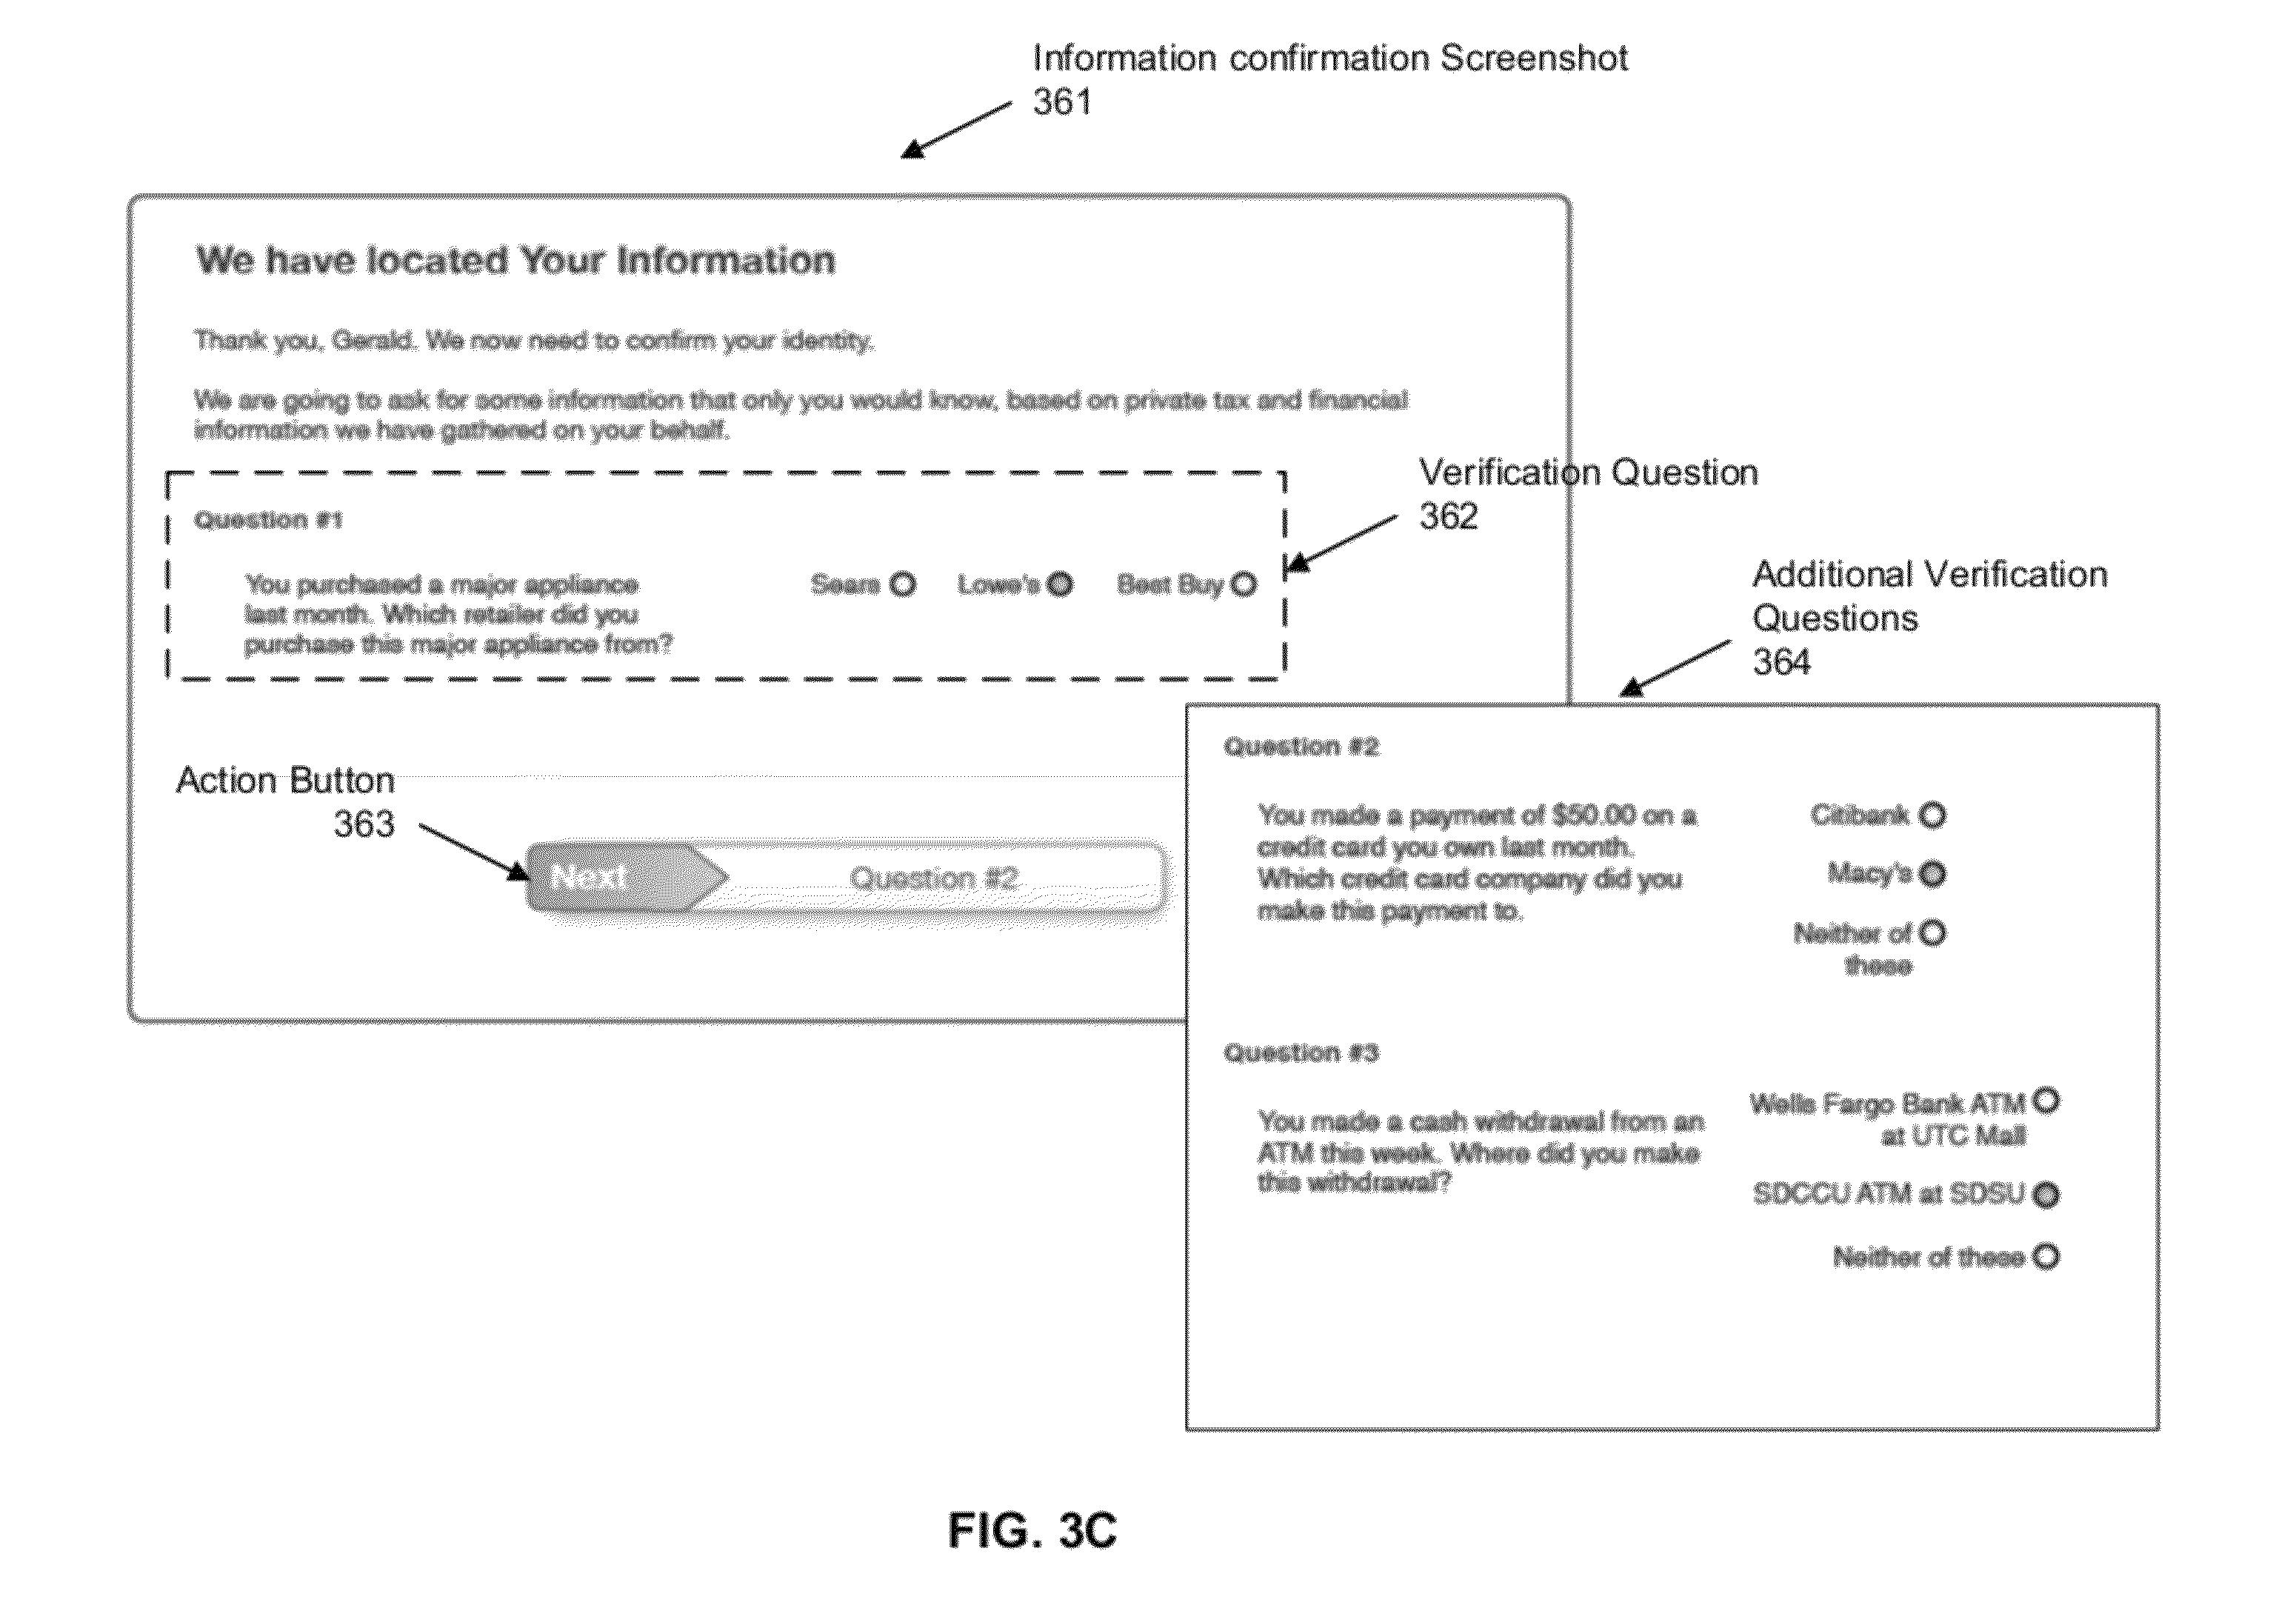 1098 t sdsu - Patent Drawing